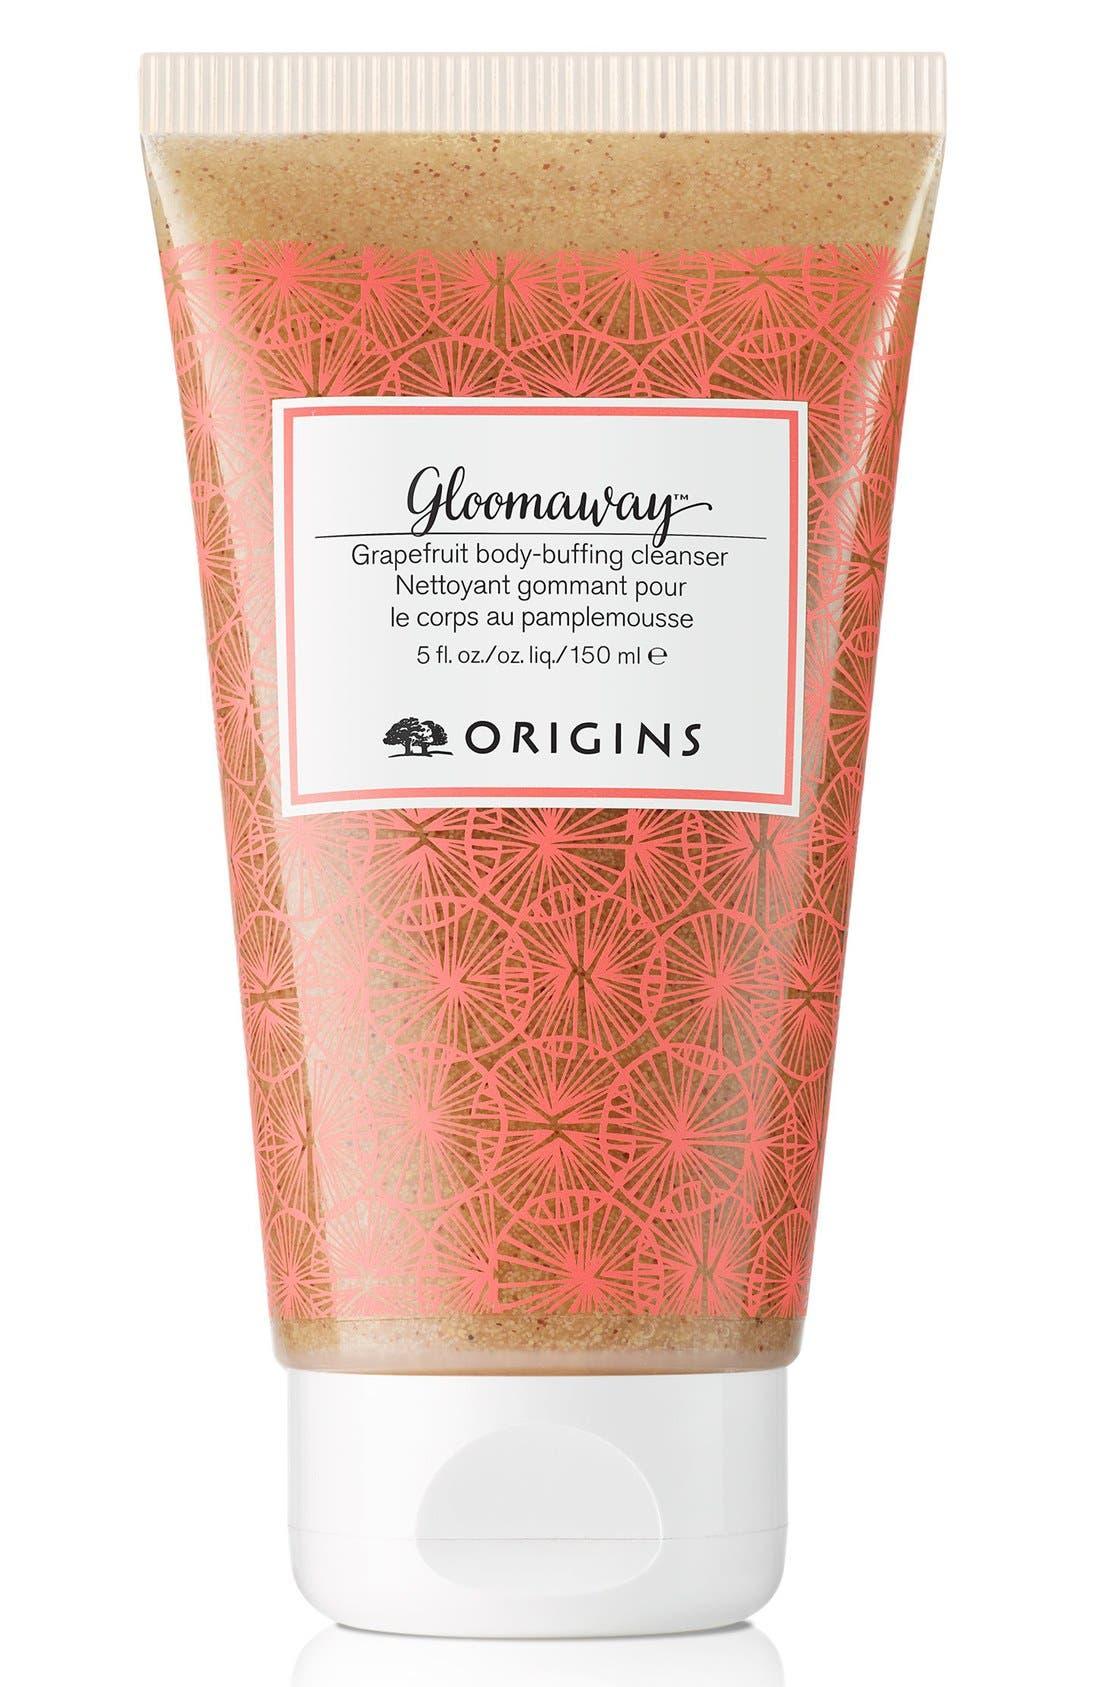 Origins Gloomaway™ Grapefruit Body-Buffing Cleanser